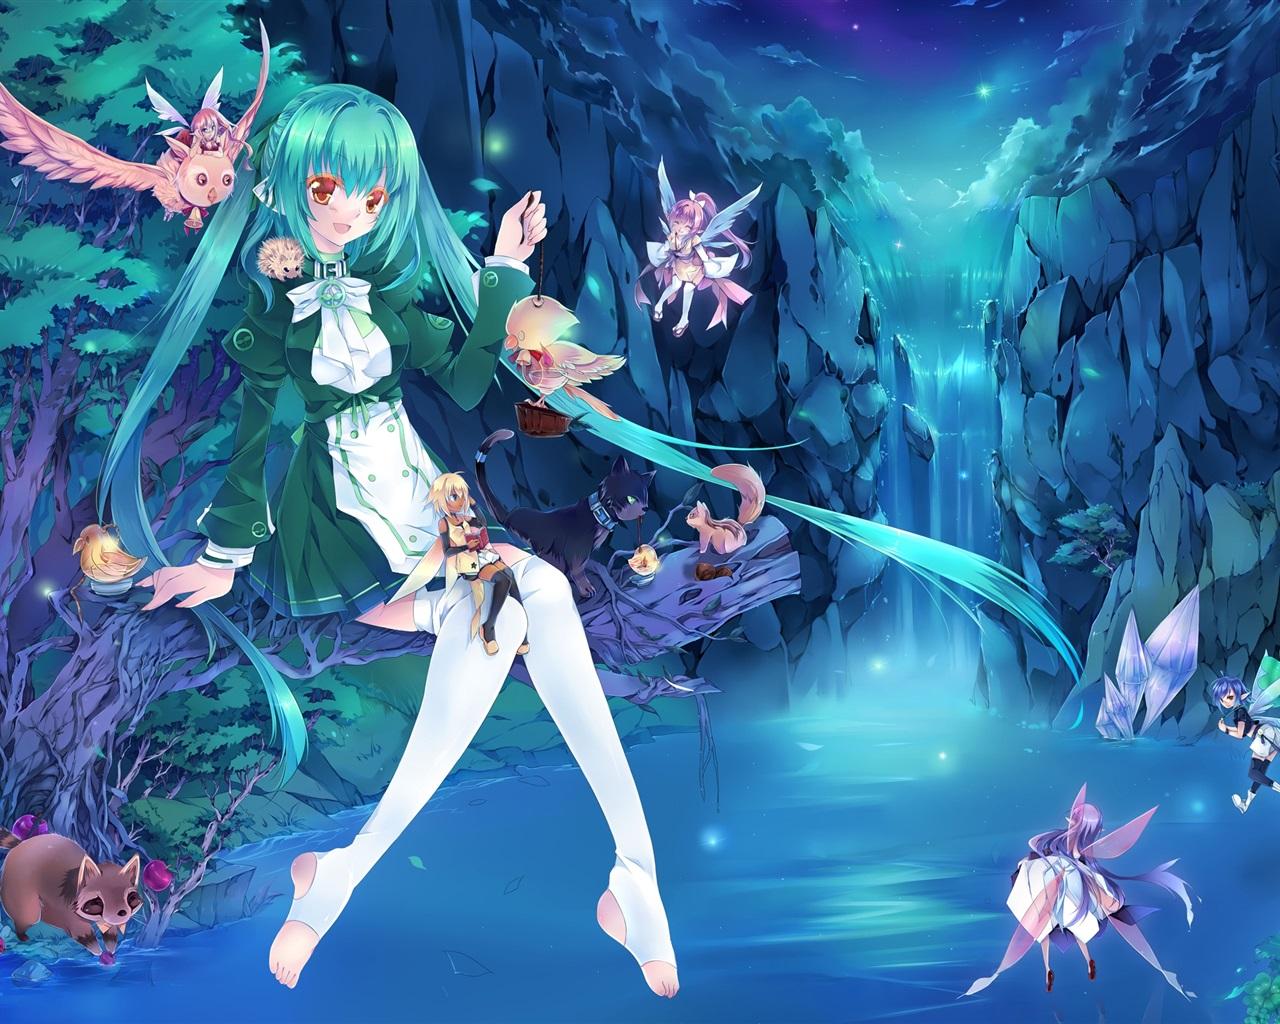 2560x1600 hd - Anime blue girl wallpaper ...